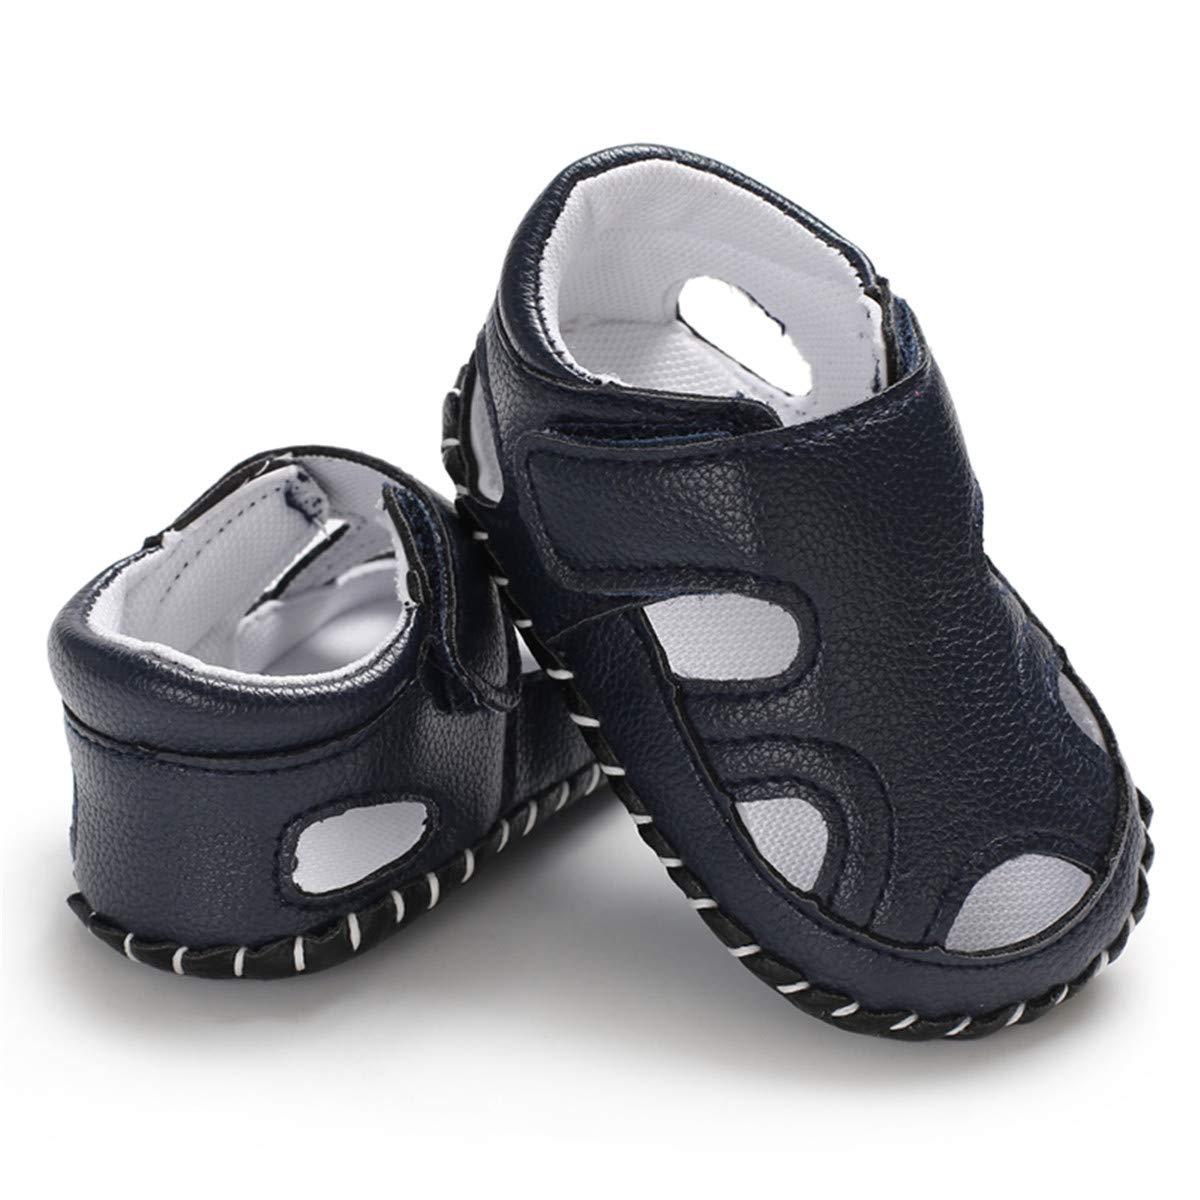 Baby Boys Girls Summer Sandals Soft Sole Anti-Slip Toddler First Walker Infant Newborn Crib Shoes